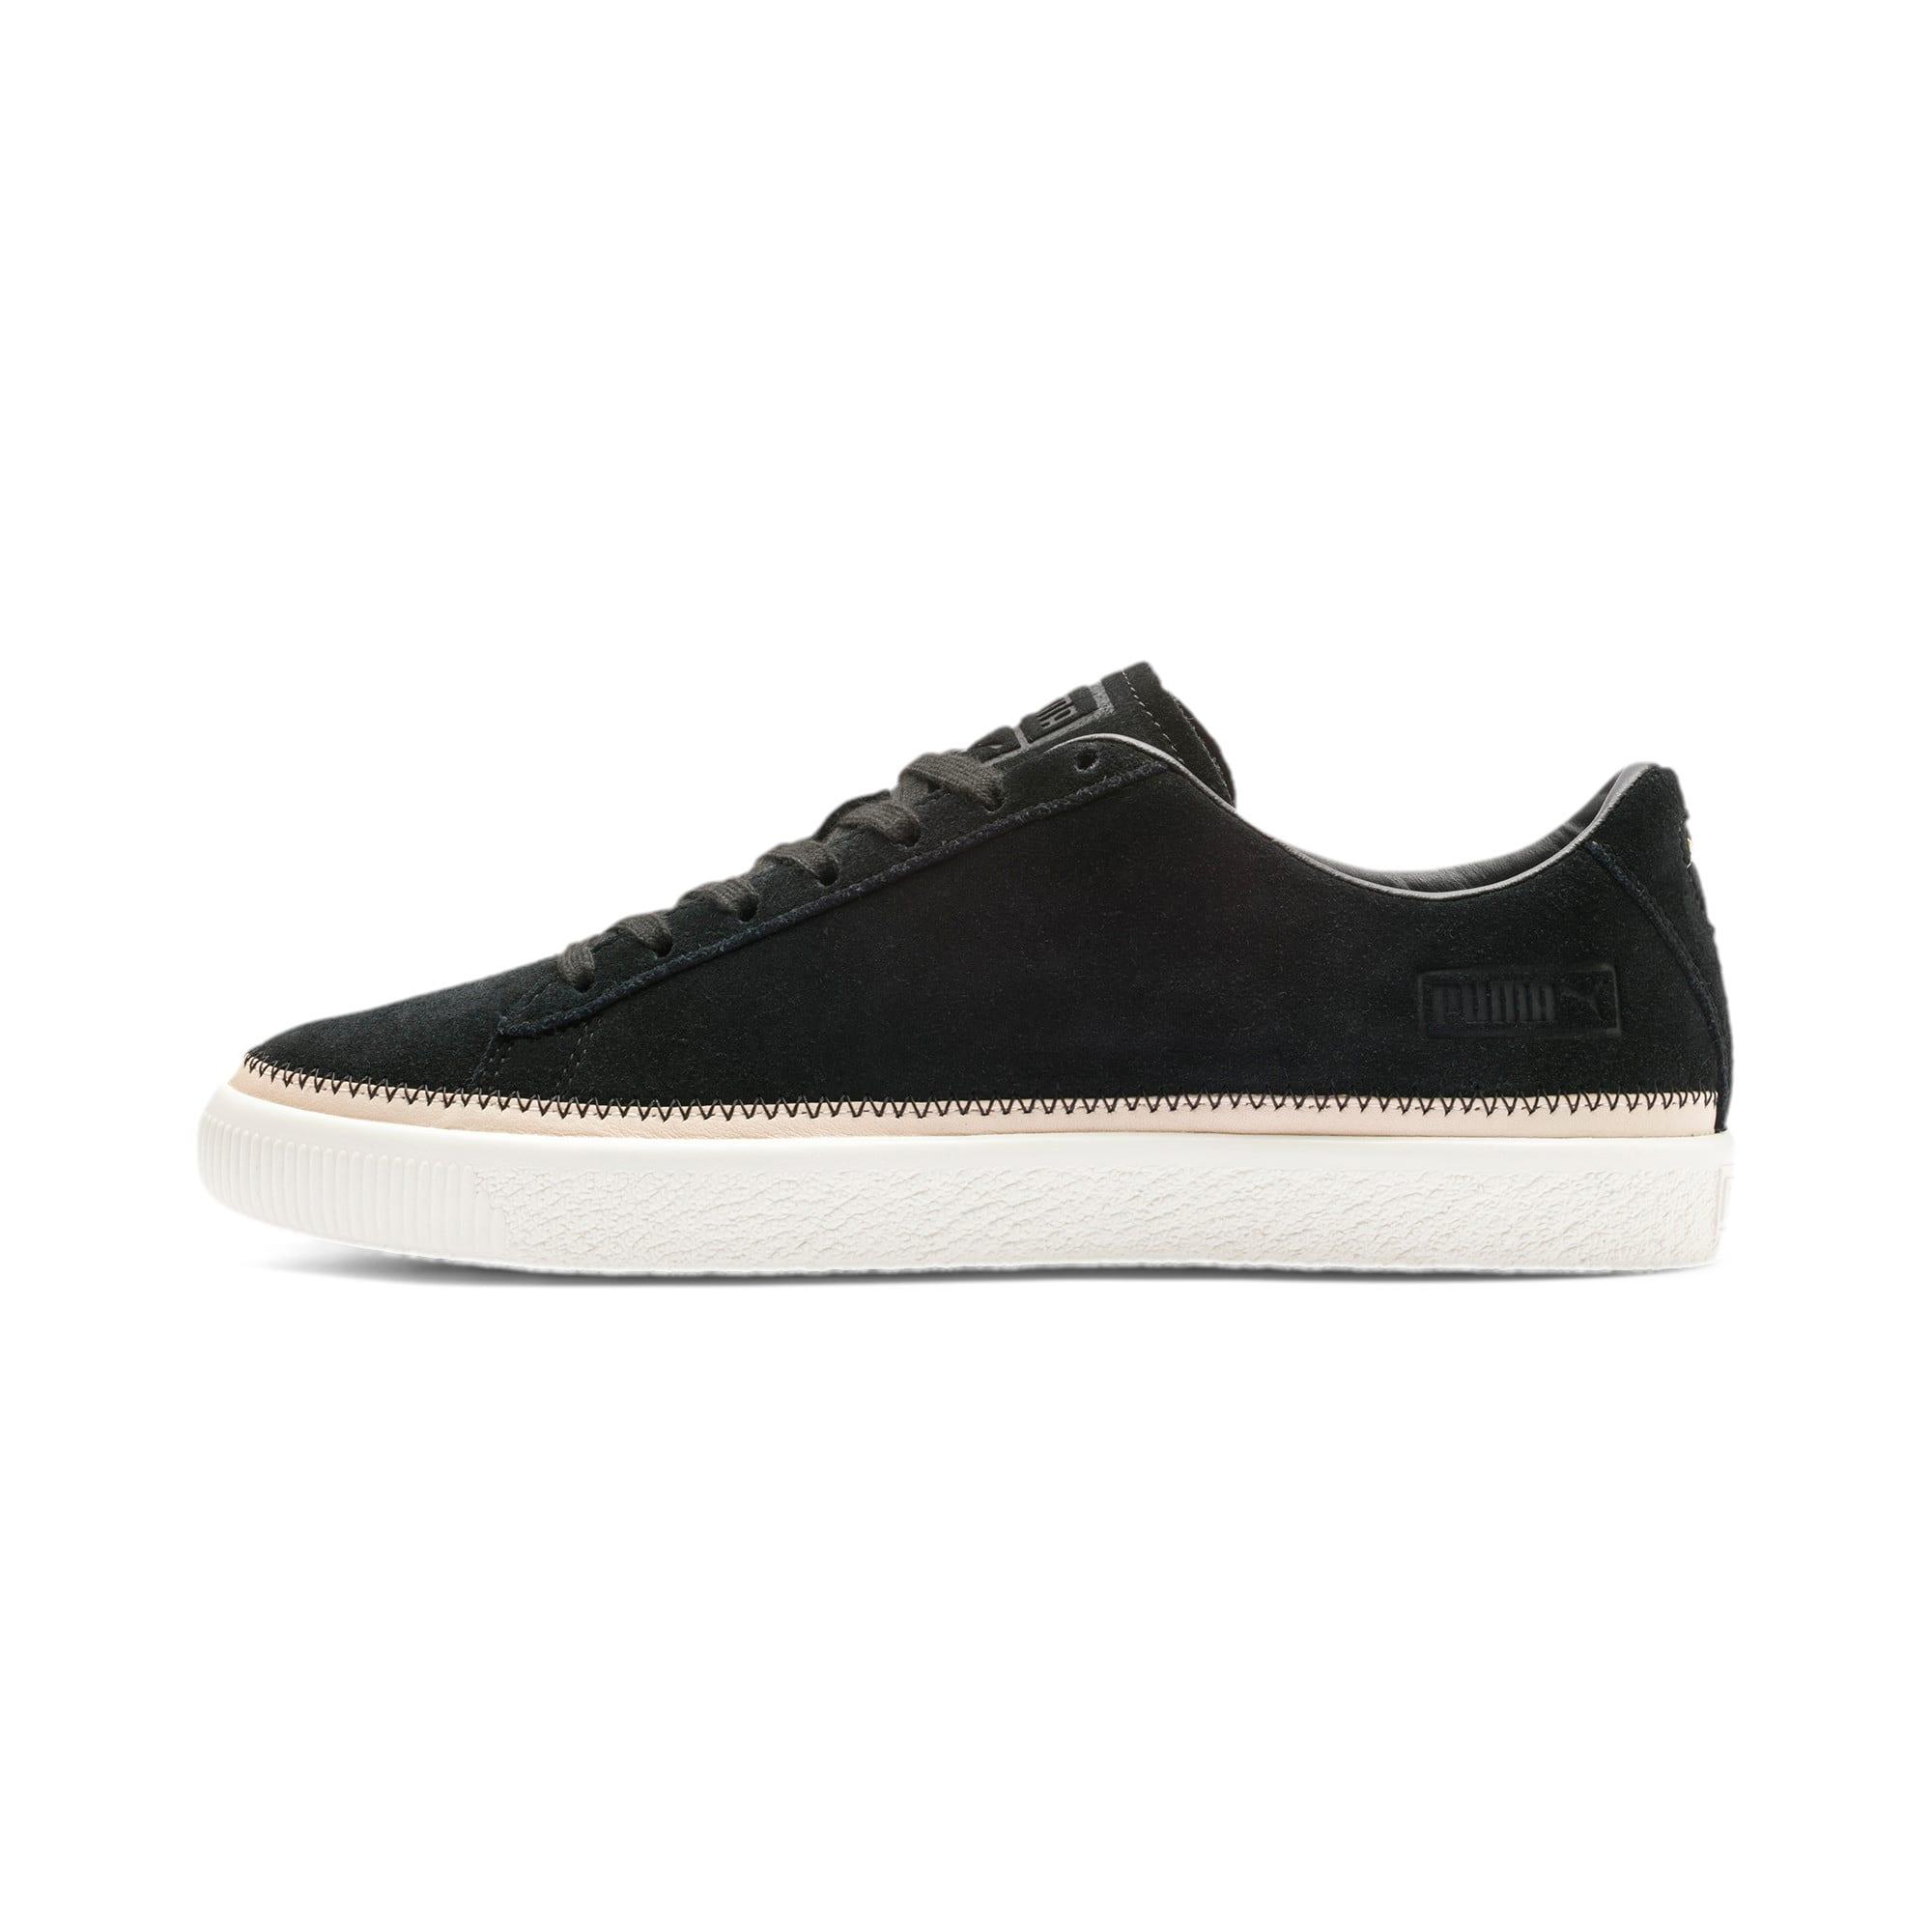 Thumbnail 1 of Suede Trim PRM Sneakers, Puma Black-Whisper White, medium